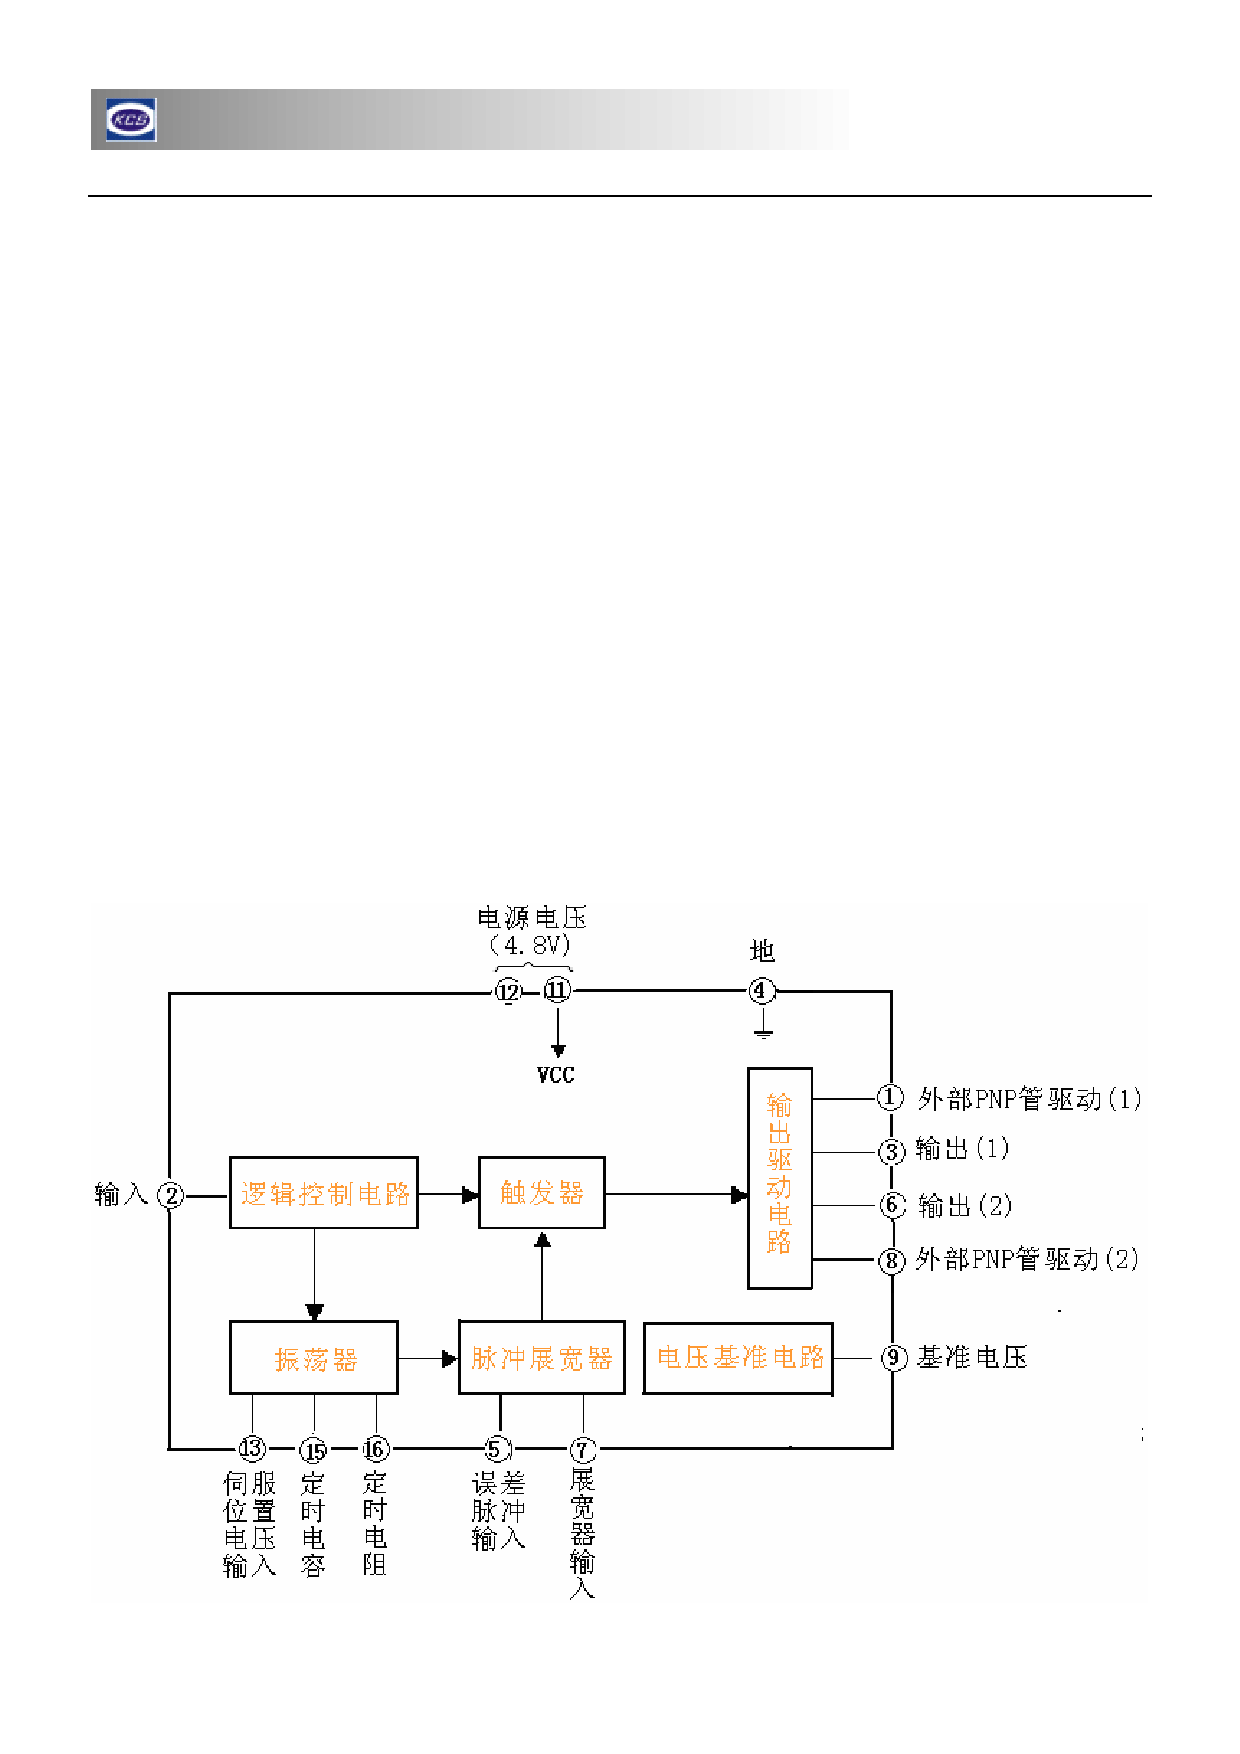 KC8801 image